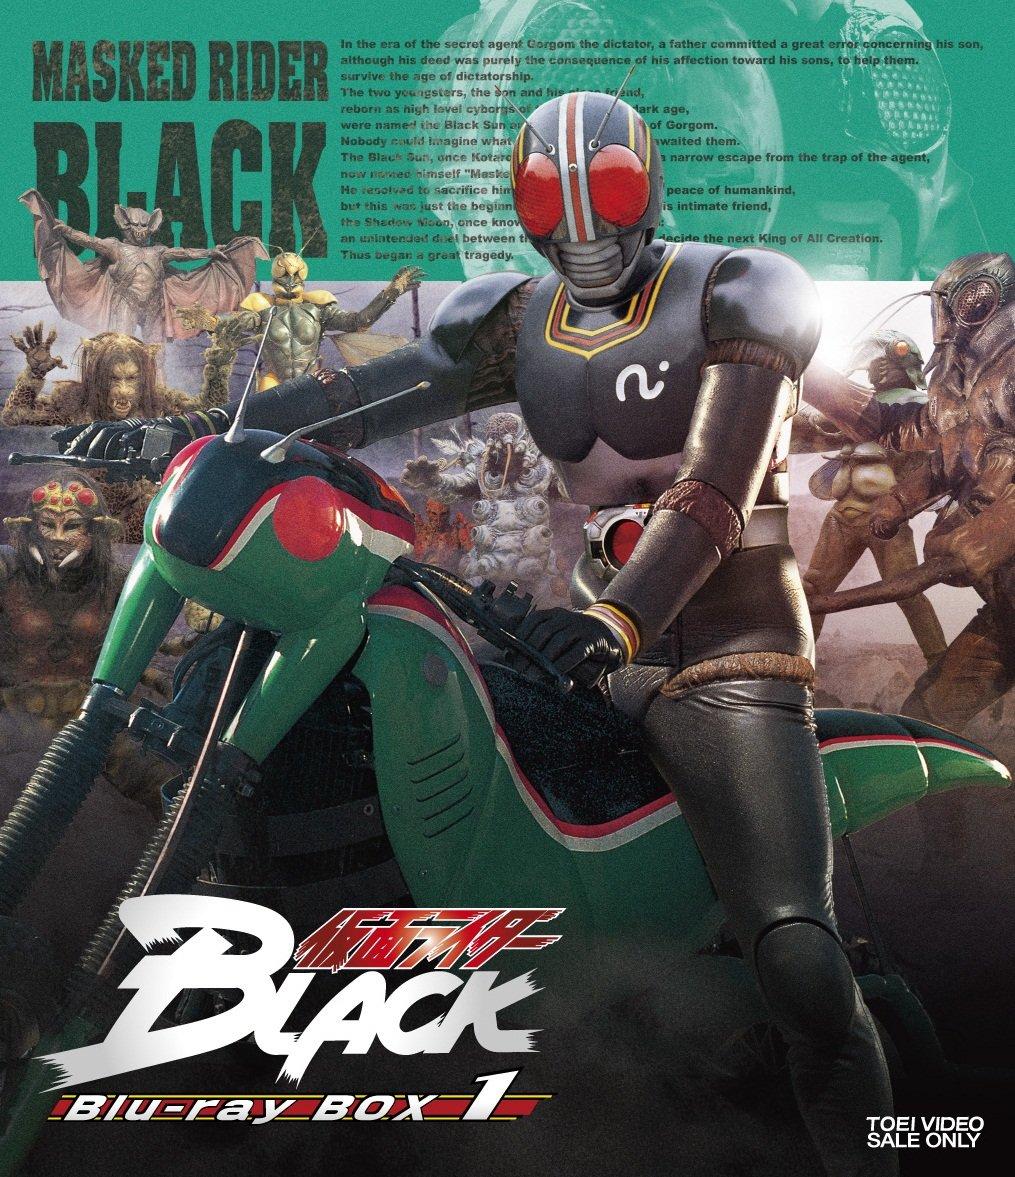 仮面ライダーBLACK Blu‐ray BOX 1 [Blu-ray] B00M3MVGUQ